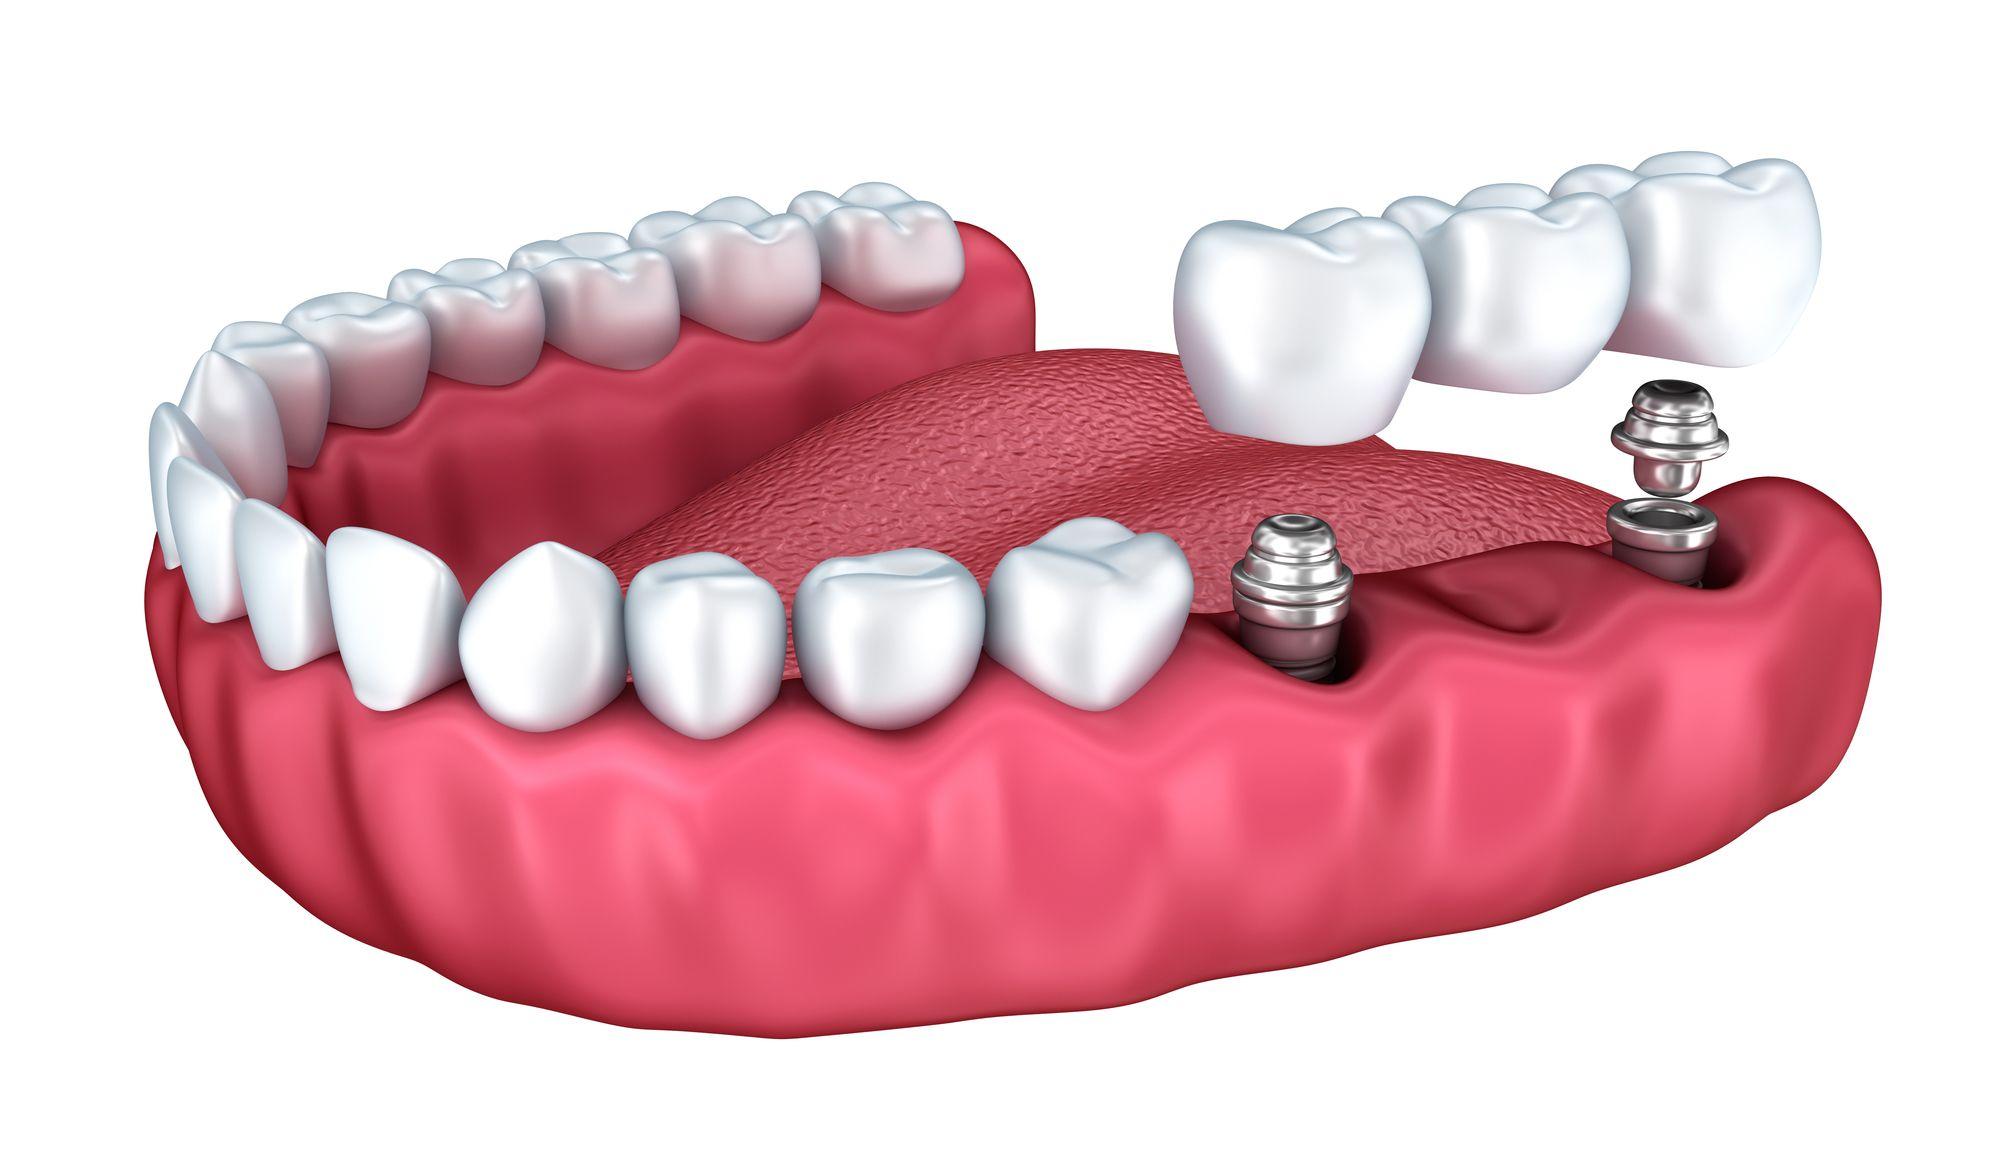 Ferber Dental Group offers high-quality, custom dental bridges in Boynton Beach.